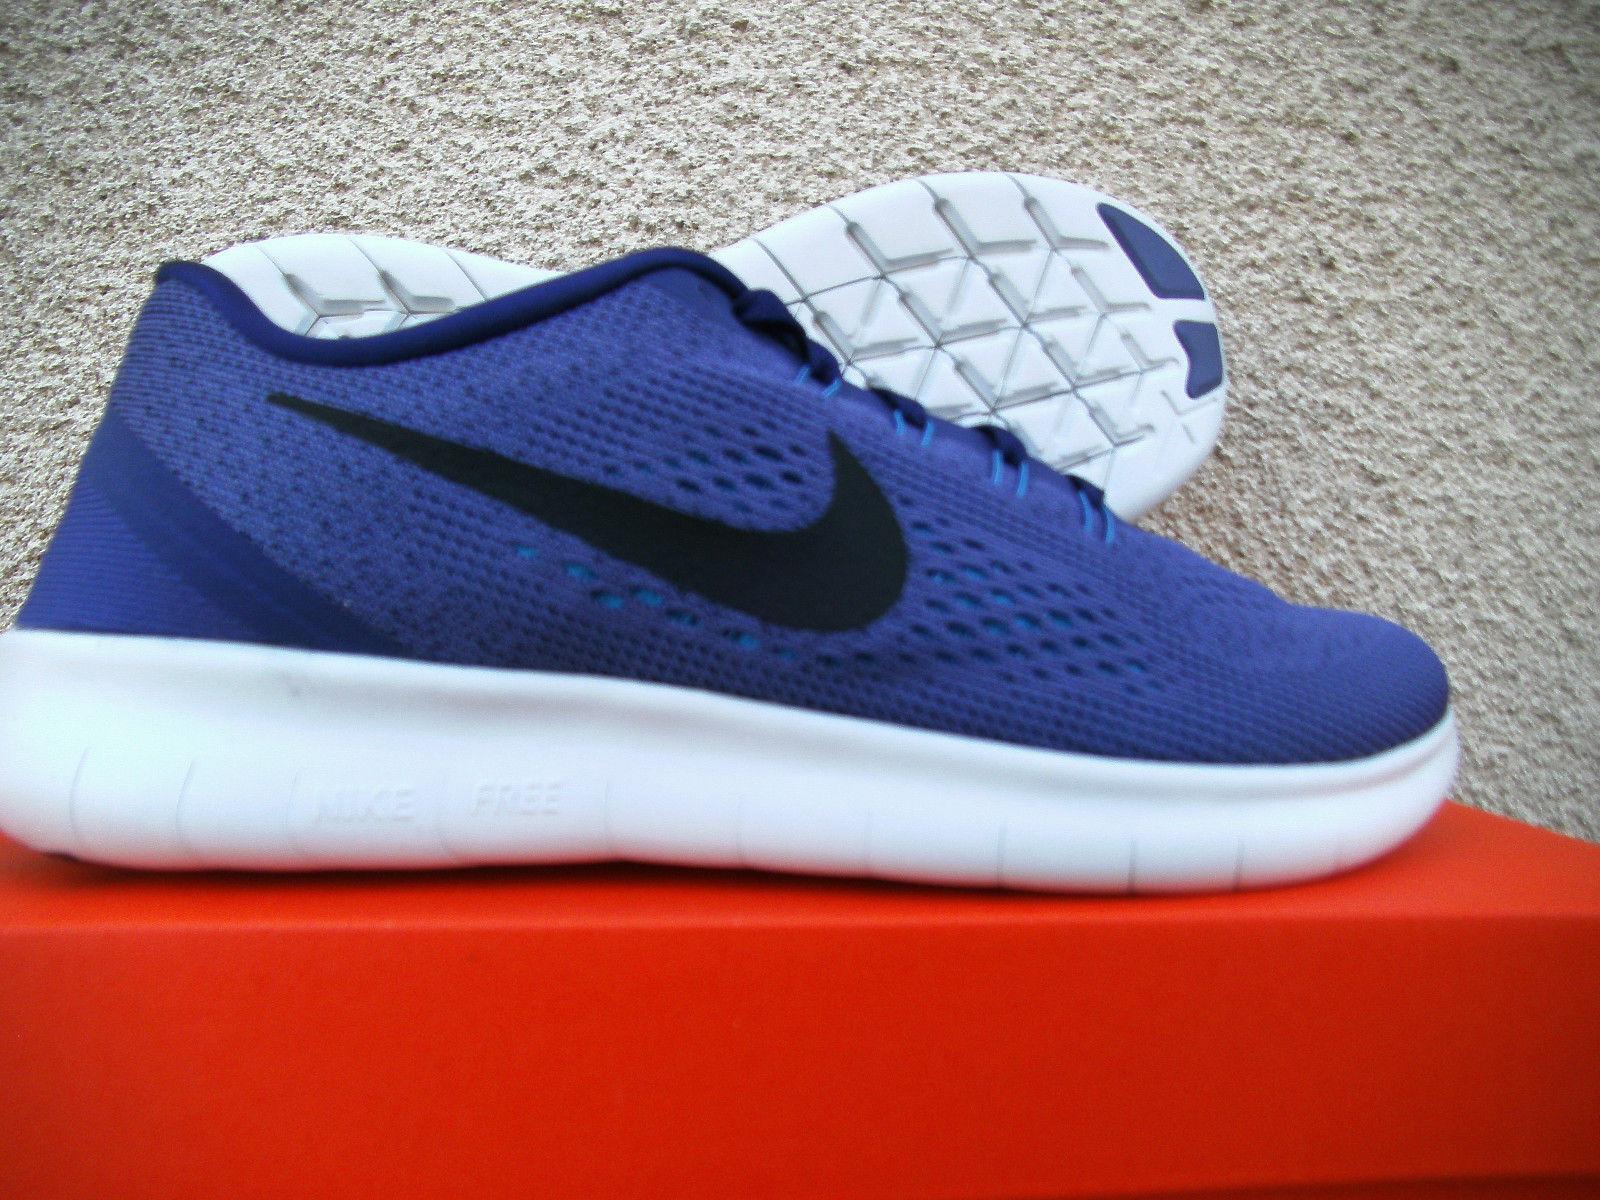 Nike Free RN (831508 500) cortos-zapatillas azul tamaños: 41 - - 41 42,5 - 44 - 44,5 78c44b